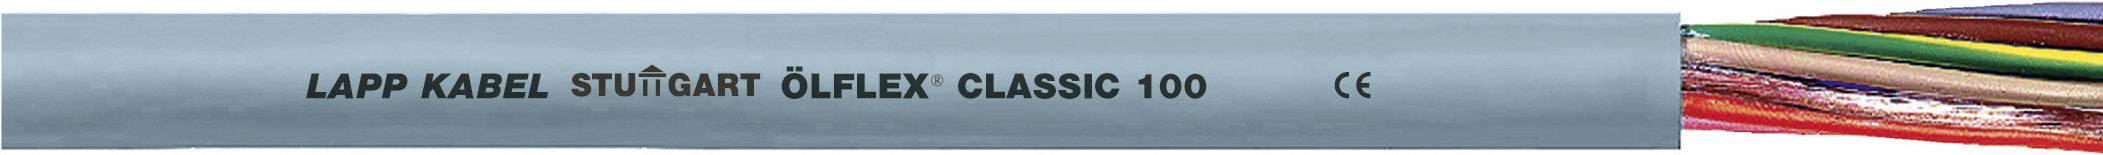 Kabel LappKabel Ölflex CLASSIC 100 5X0,5 (00101244), PVC, 6,2 mm, 500 V, šedá, 1000 m